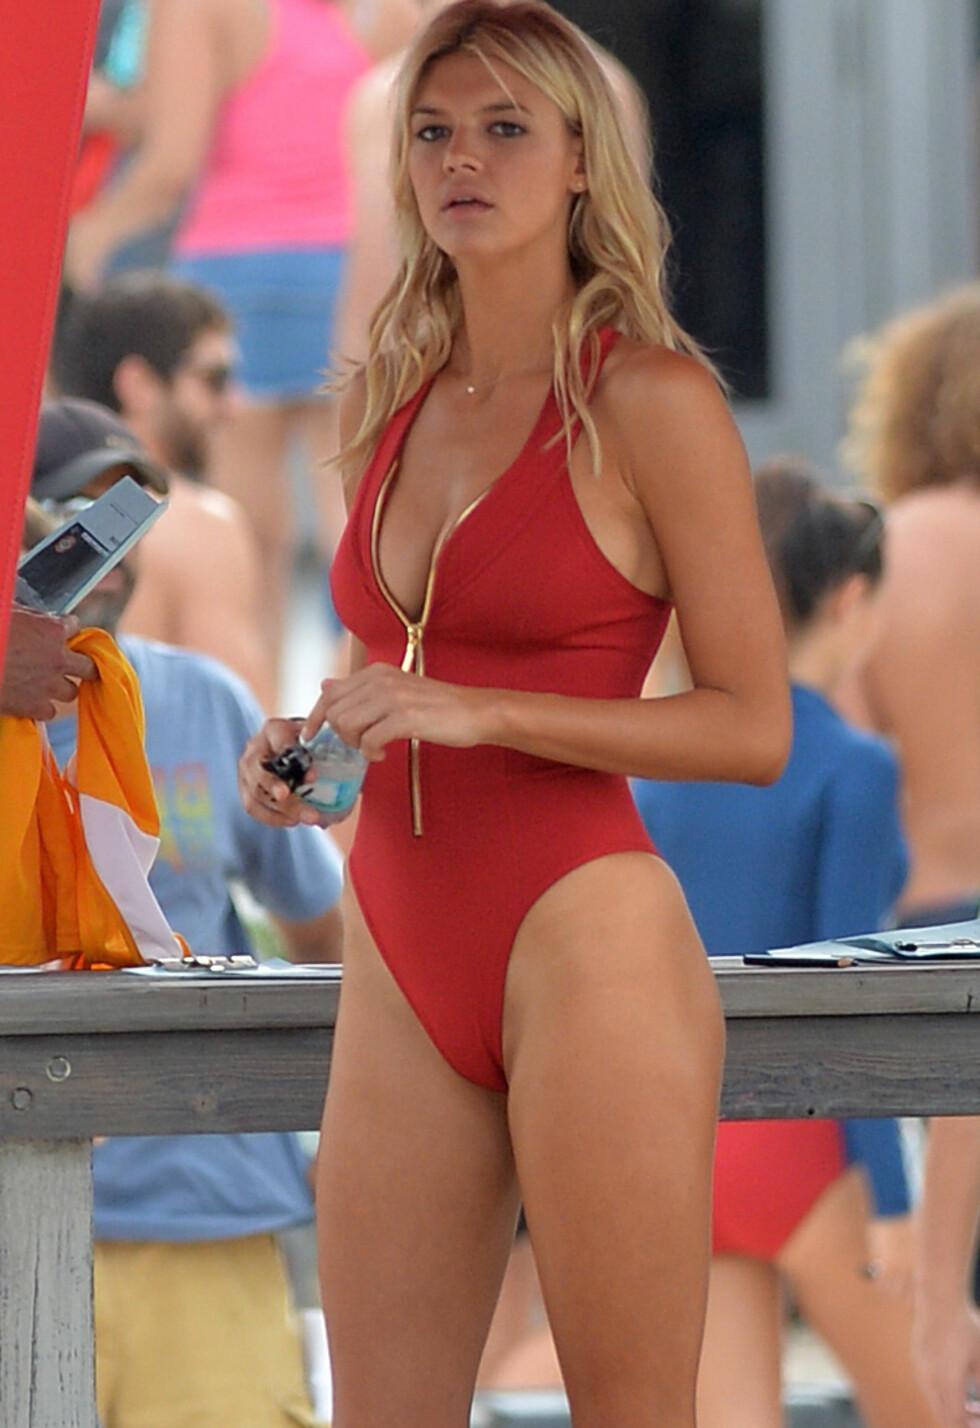 Sports Illustrated modell Kelly Rohrbach spiller C. J. Parker.  Foto: Splash News